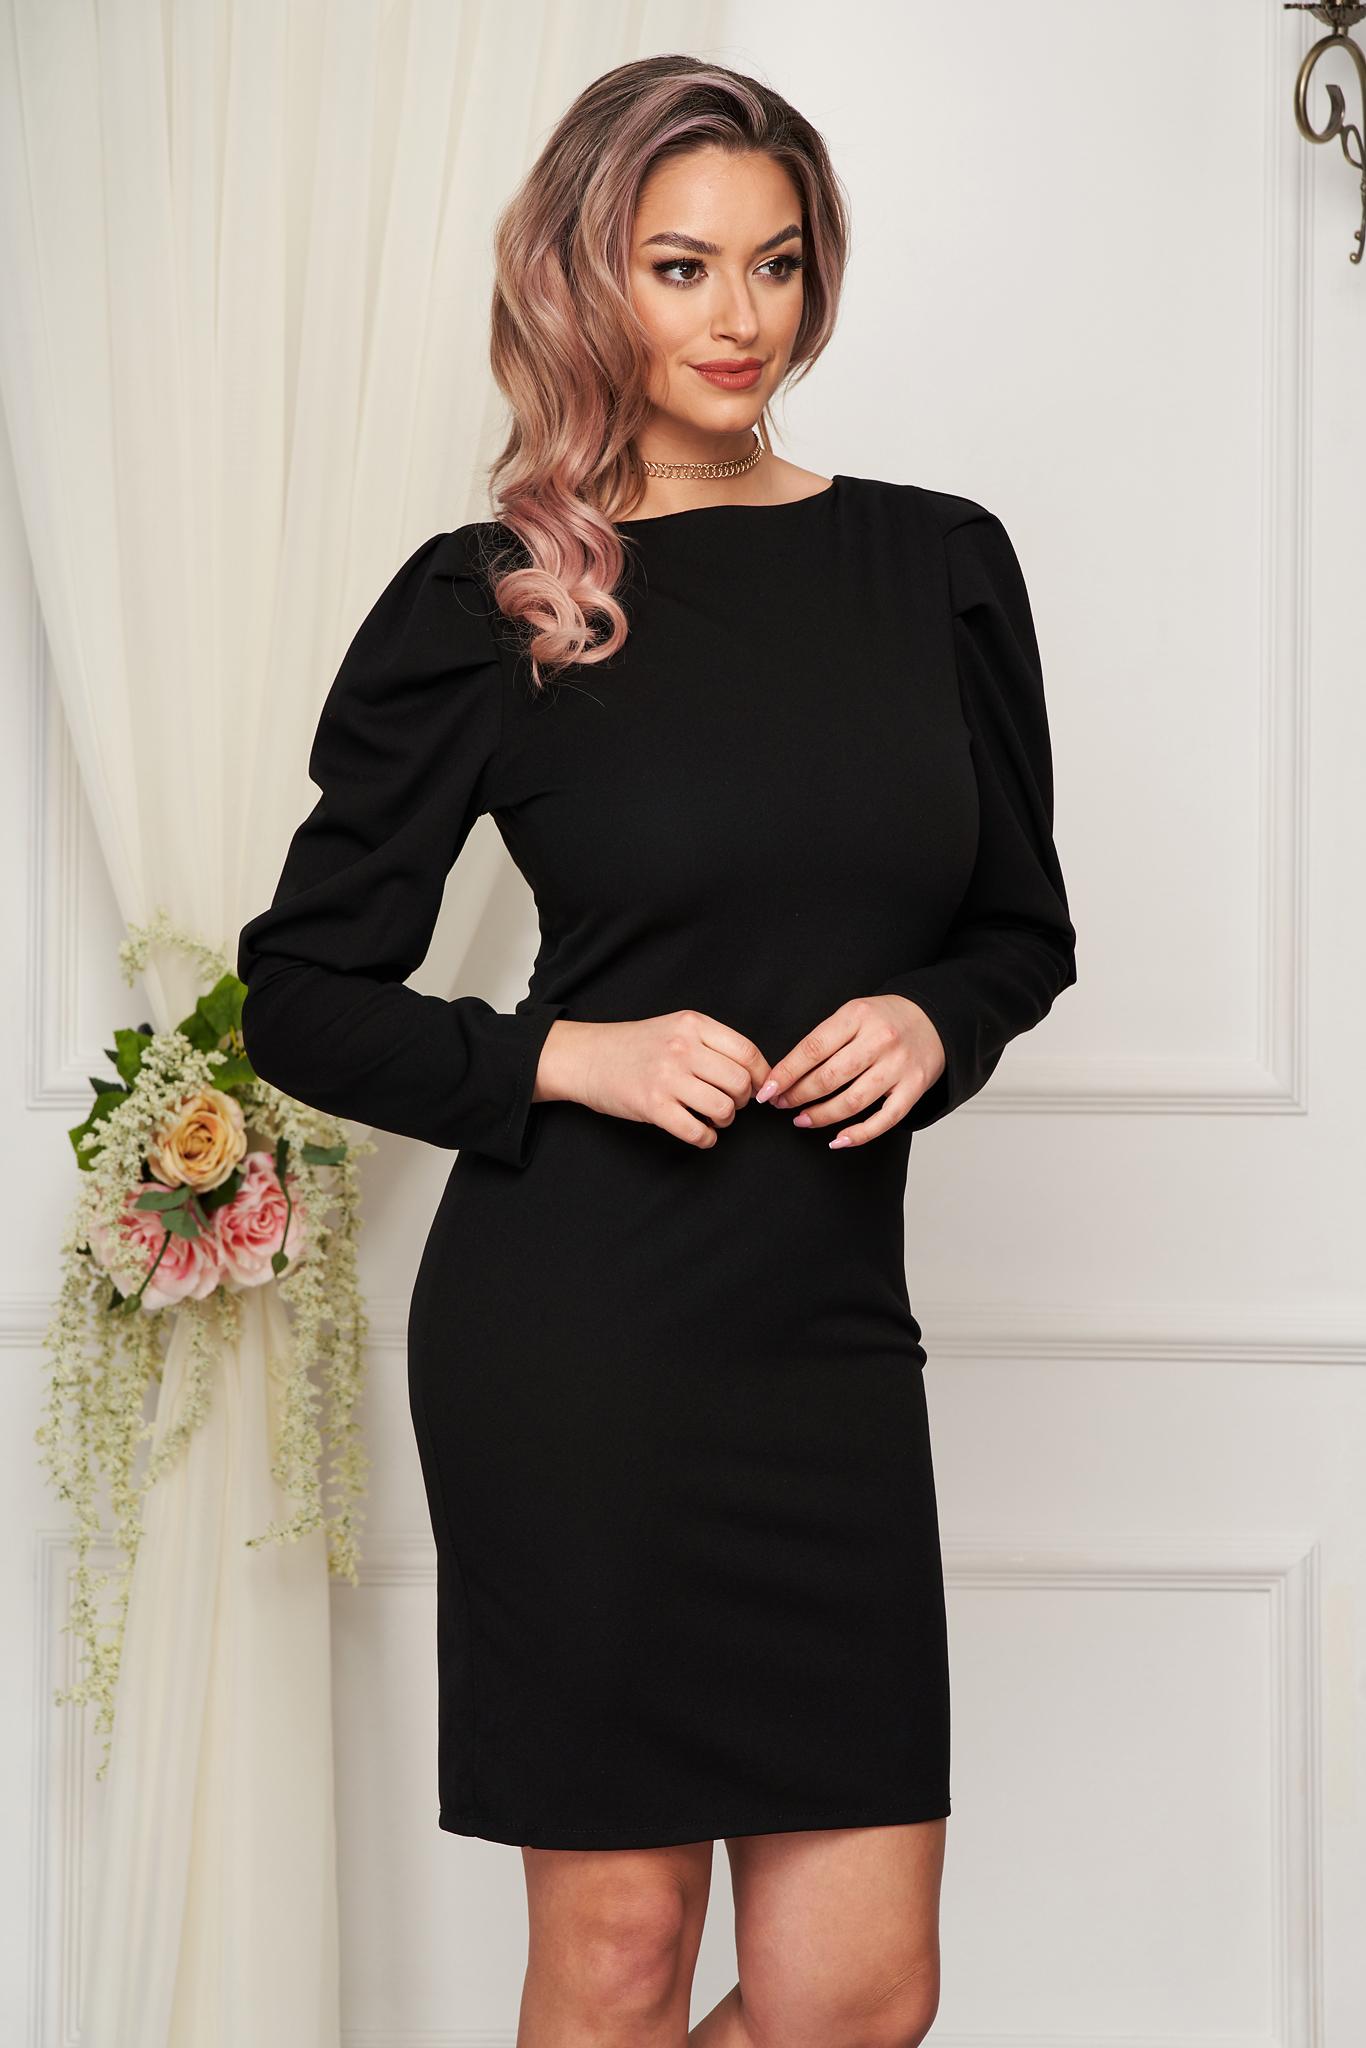 Rochie neagra scurta din material usor elastic cu croi larg si umeri cu volum